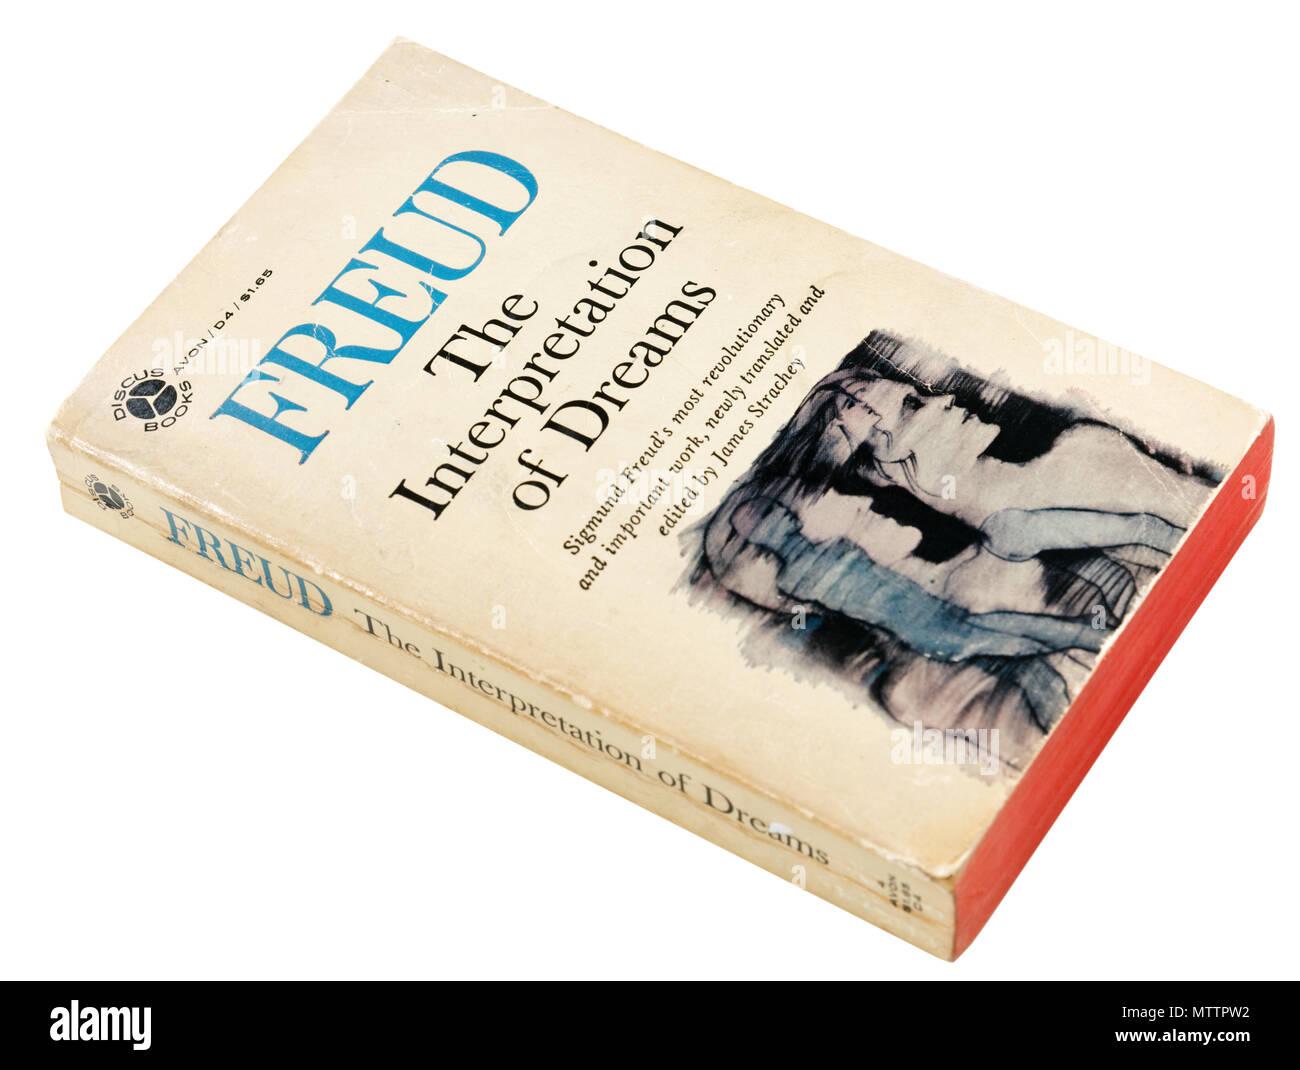 The Interpretation of Dreams by Sigmund Freud - Stock Image